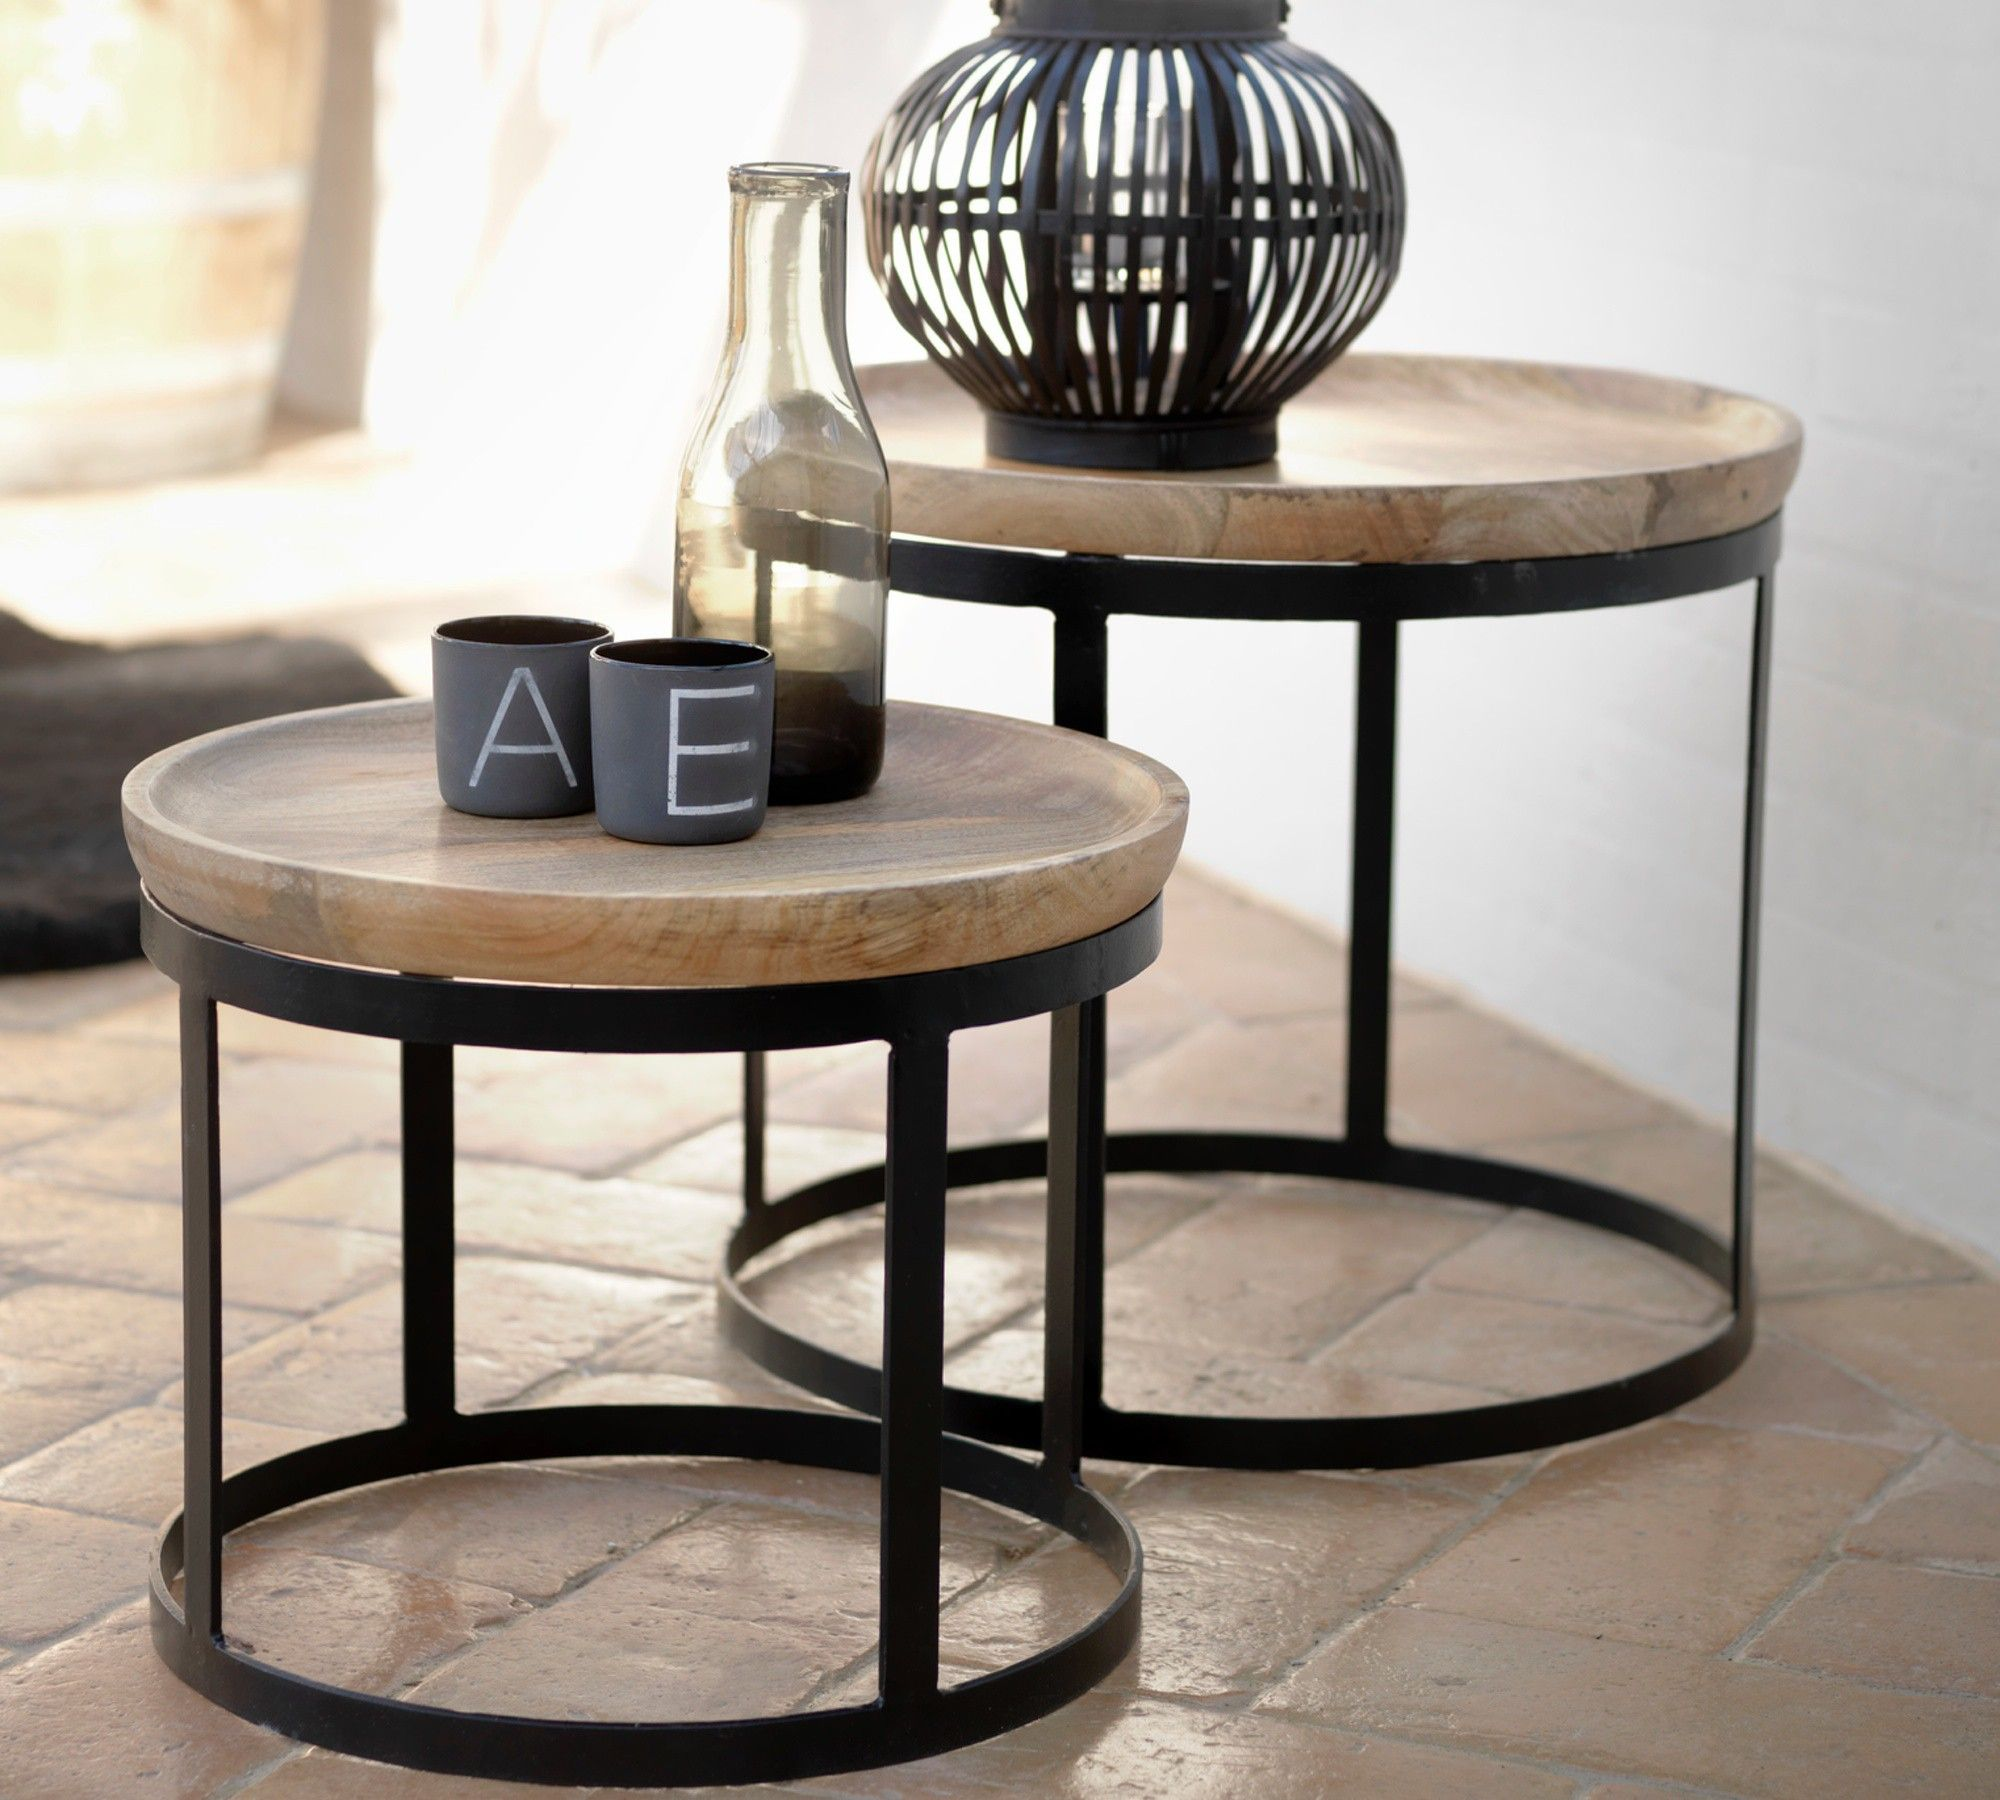 Beistelltisch Set gabler design beistelltisch 2er set paolo spiegel